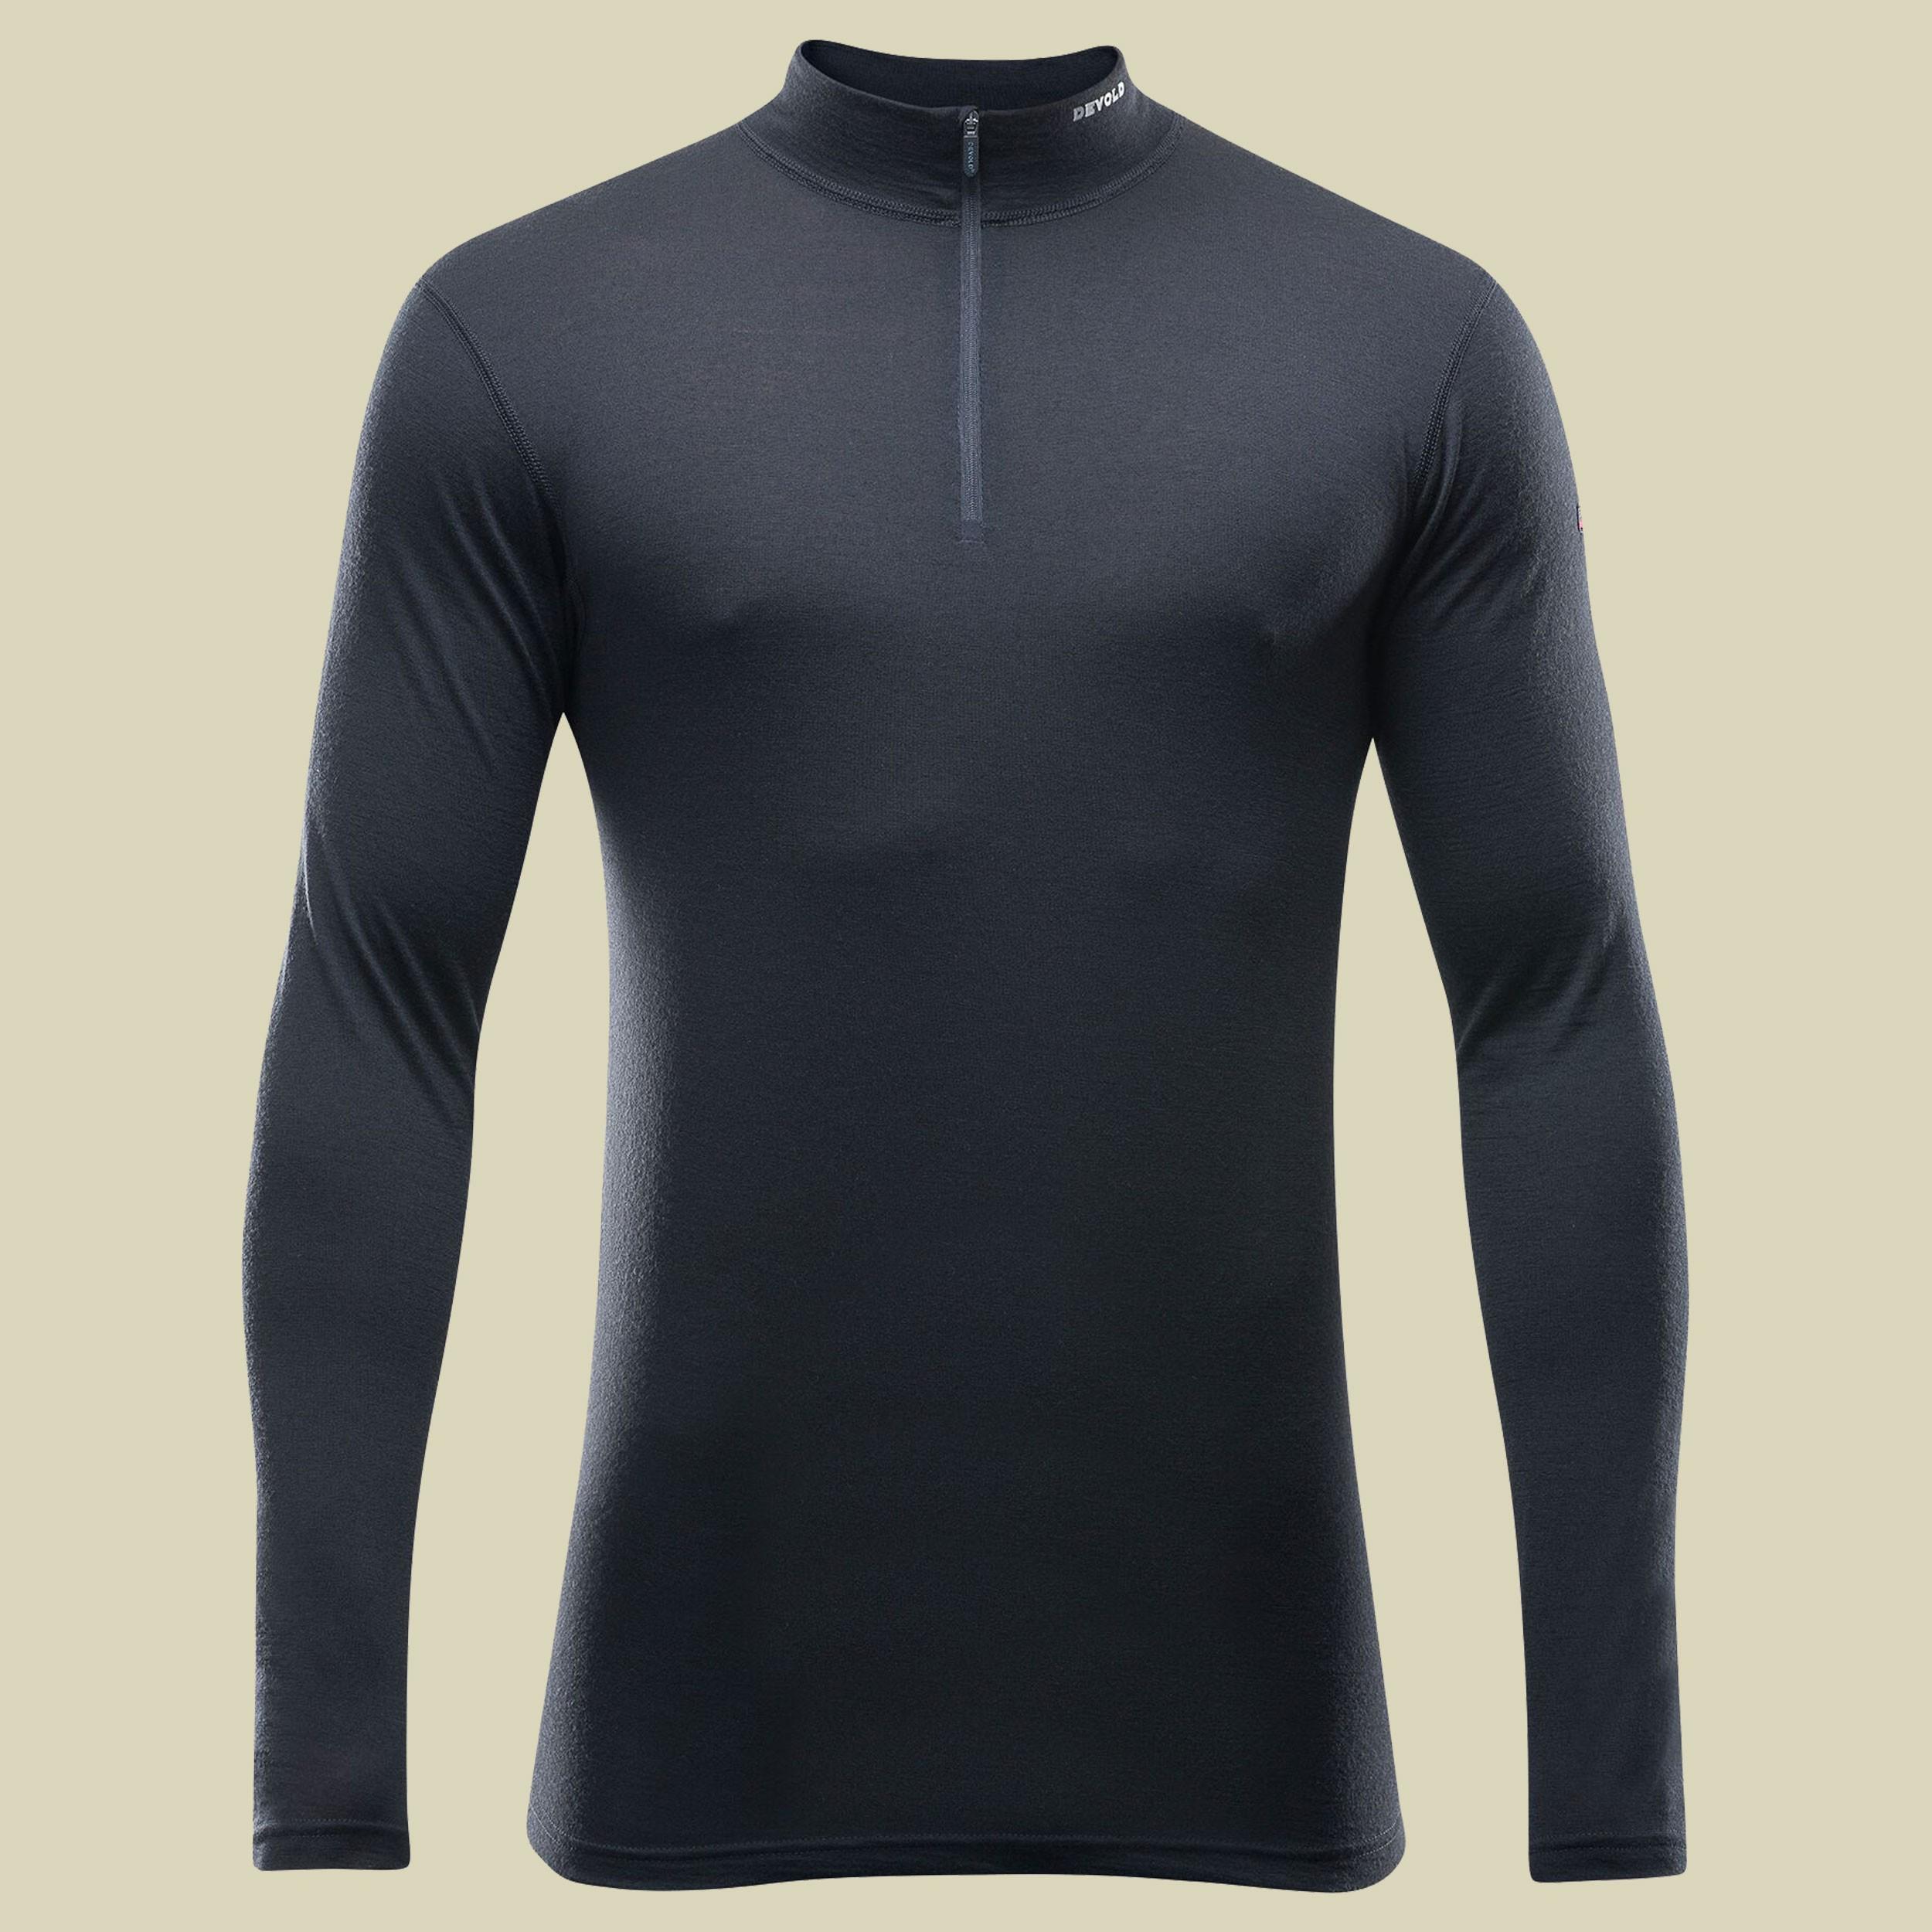 Devold Herren Langarm Funktionsshirt Merinowolle Breeze Man Shirt V Neck *NEU